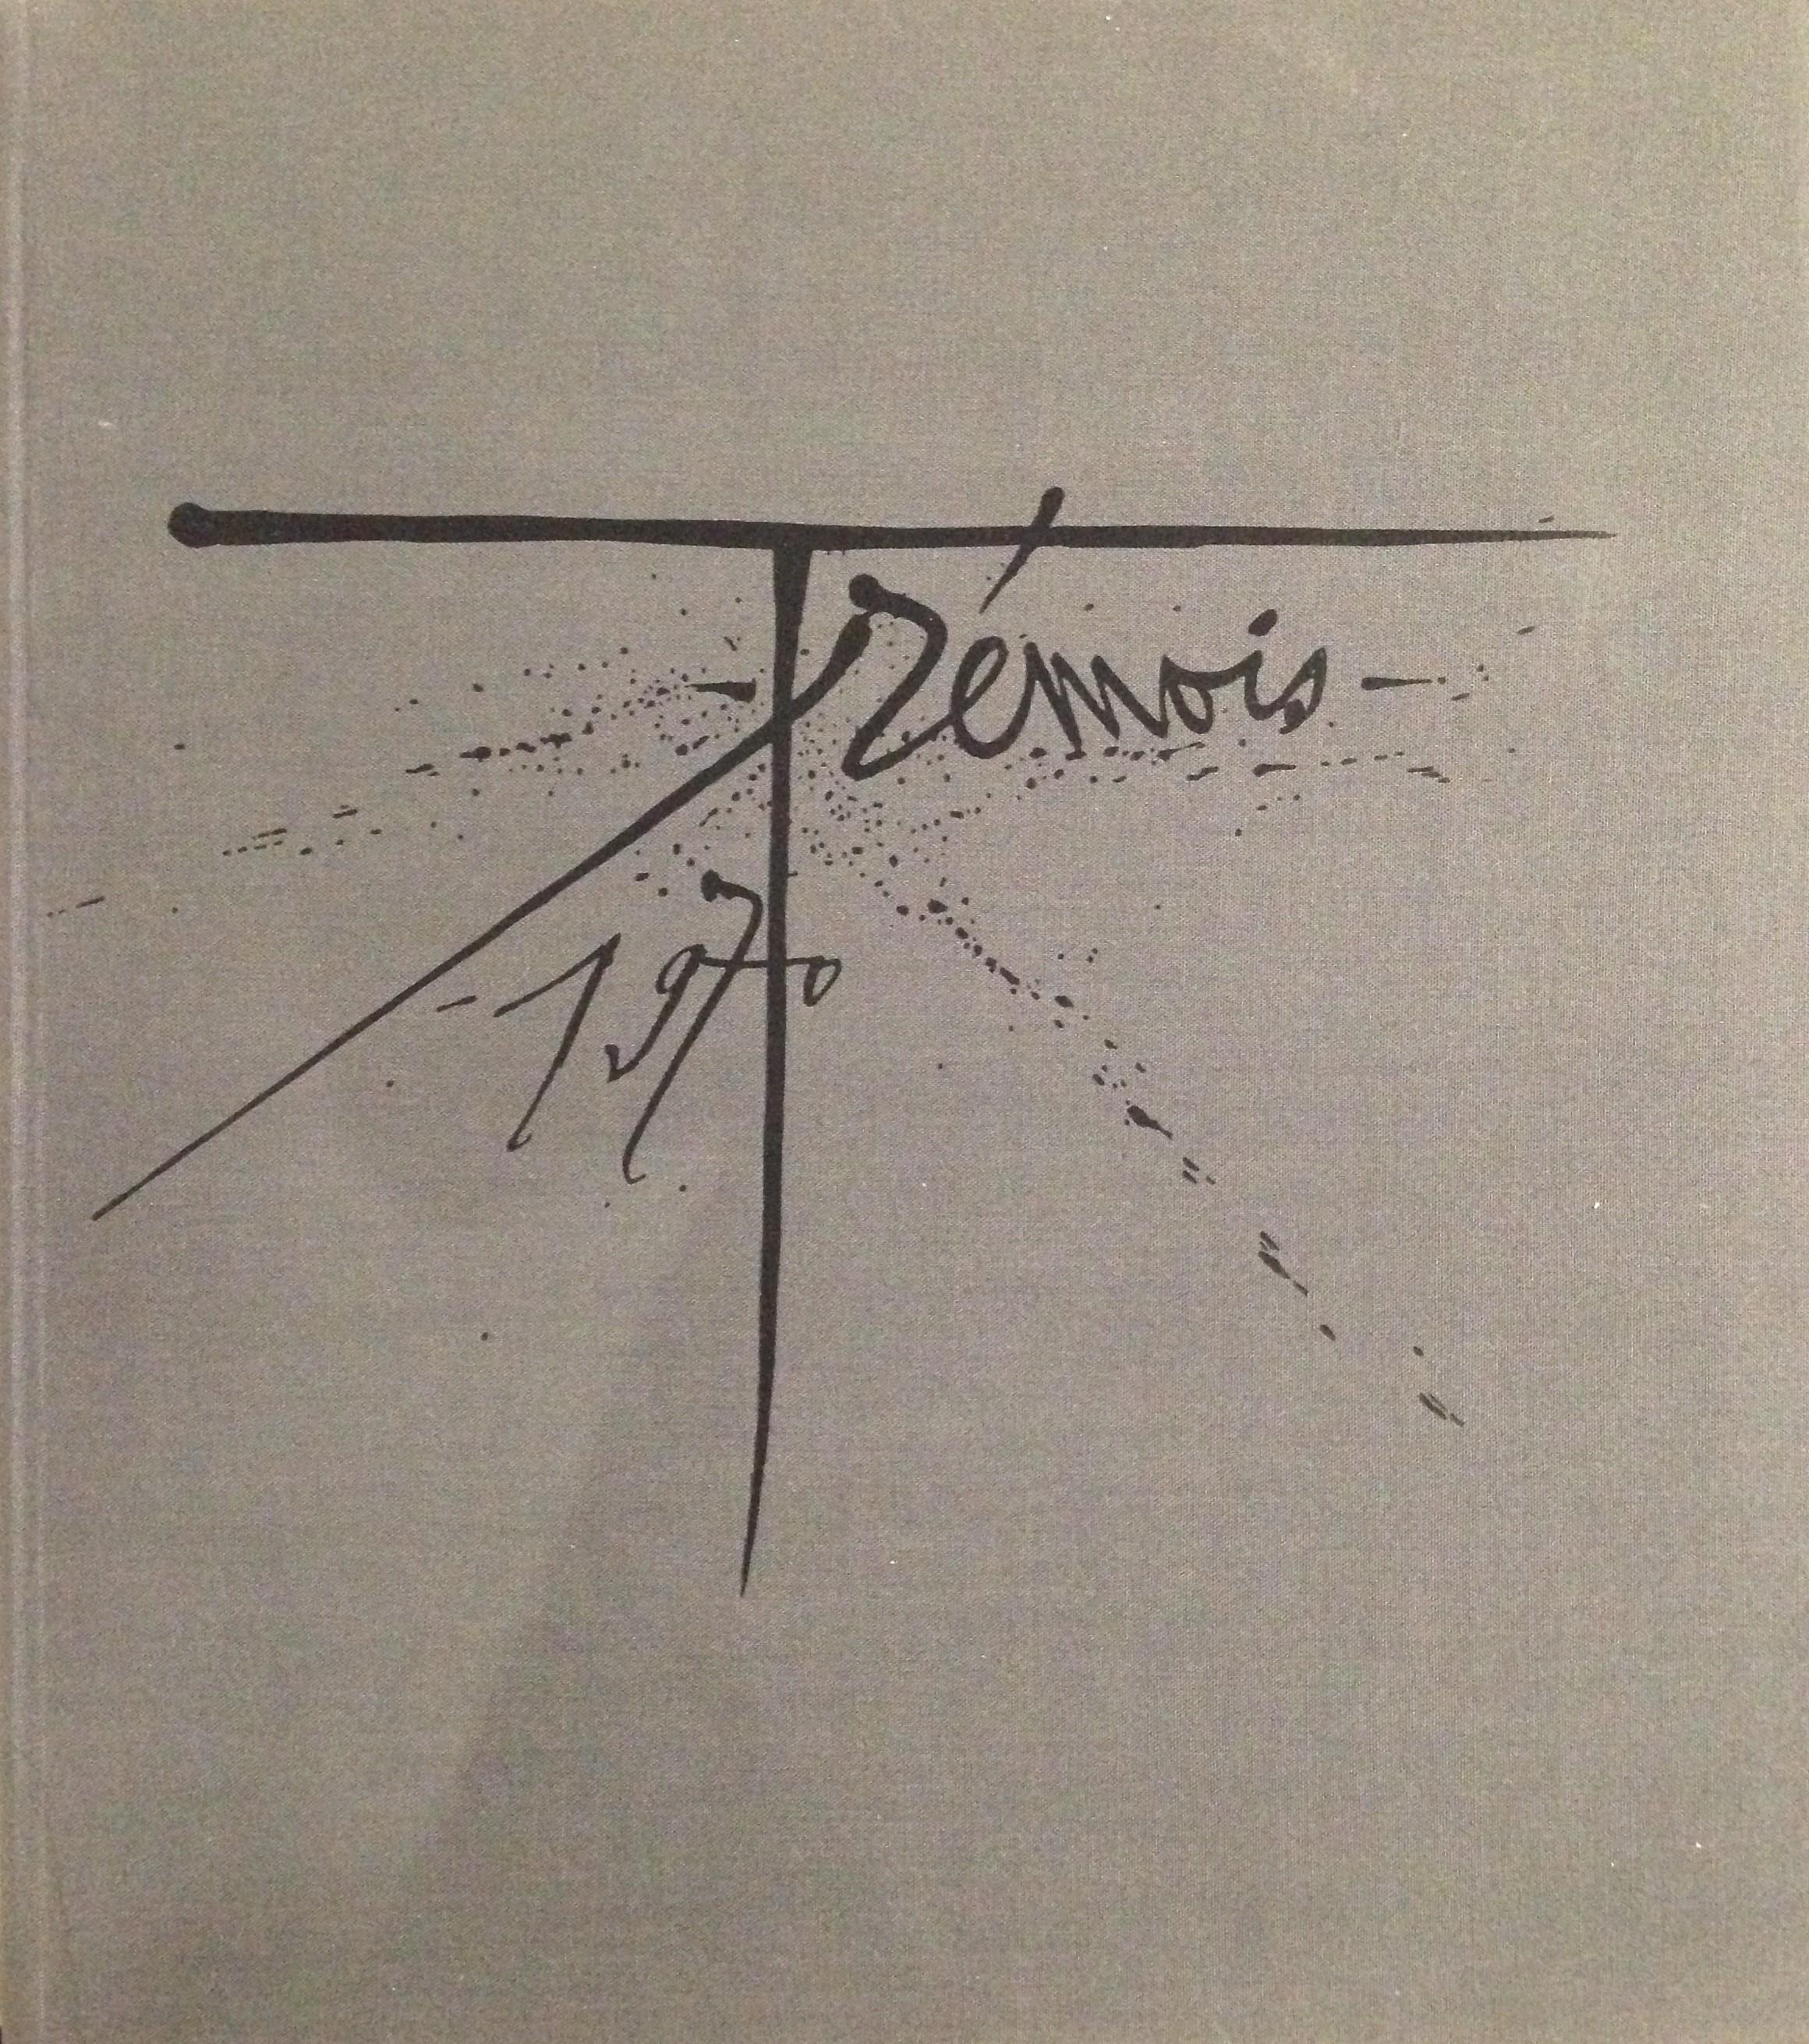 Pierre-Yves TREMOIS: gravure monotypes